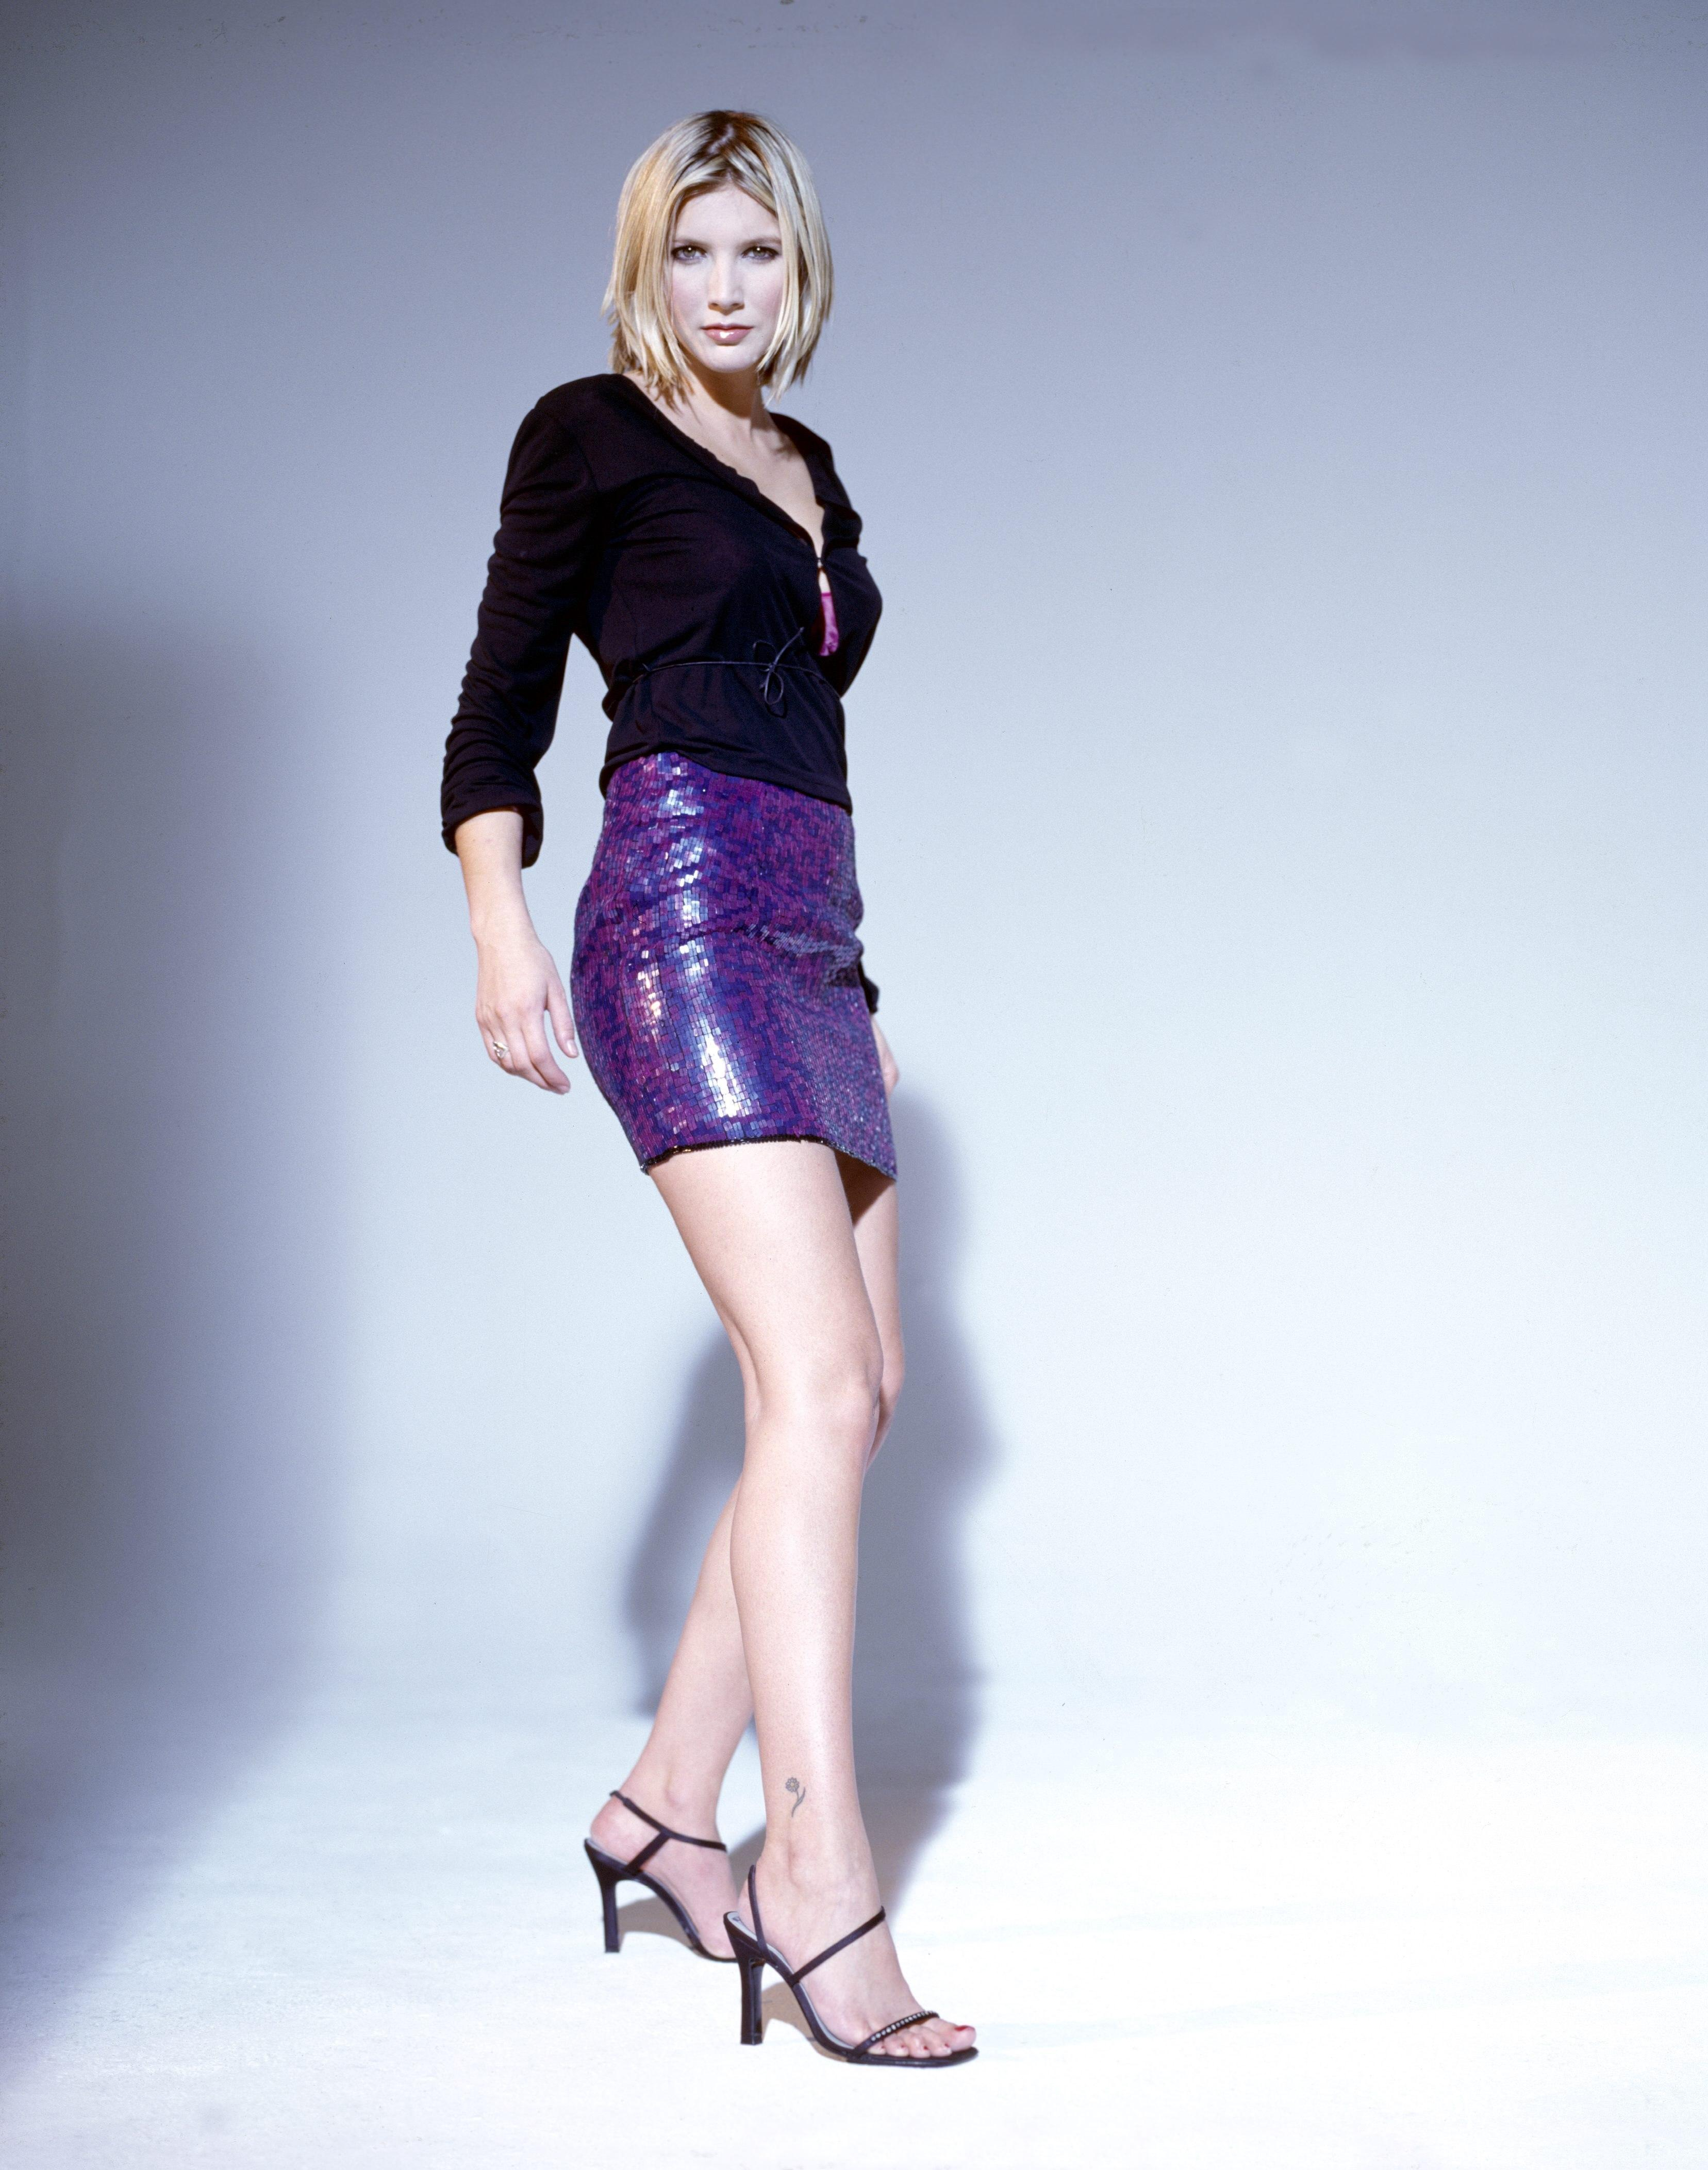 Anna Kanakis (born 1962),Dina Eastwood Adult pics & movies Sylvia Grey,Belinda Mayne